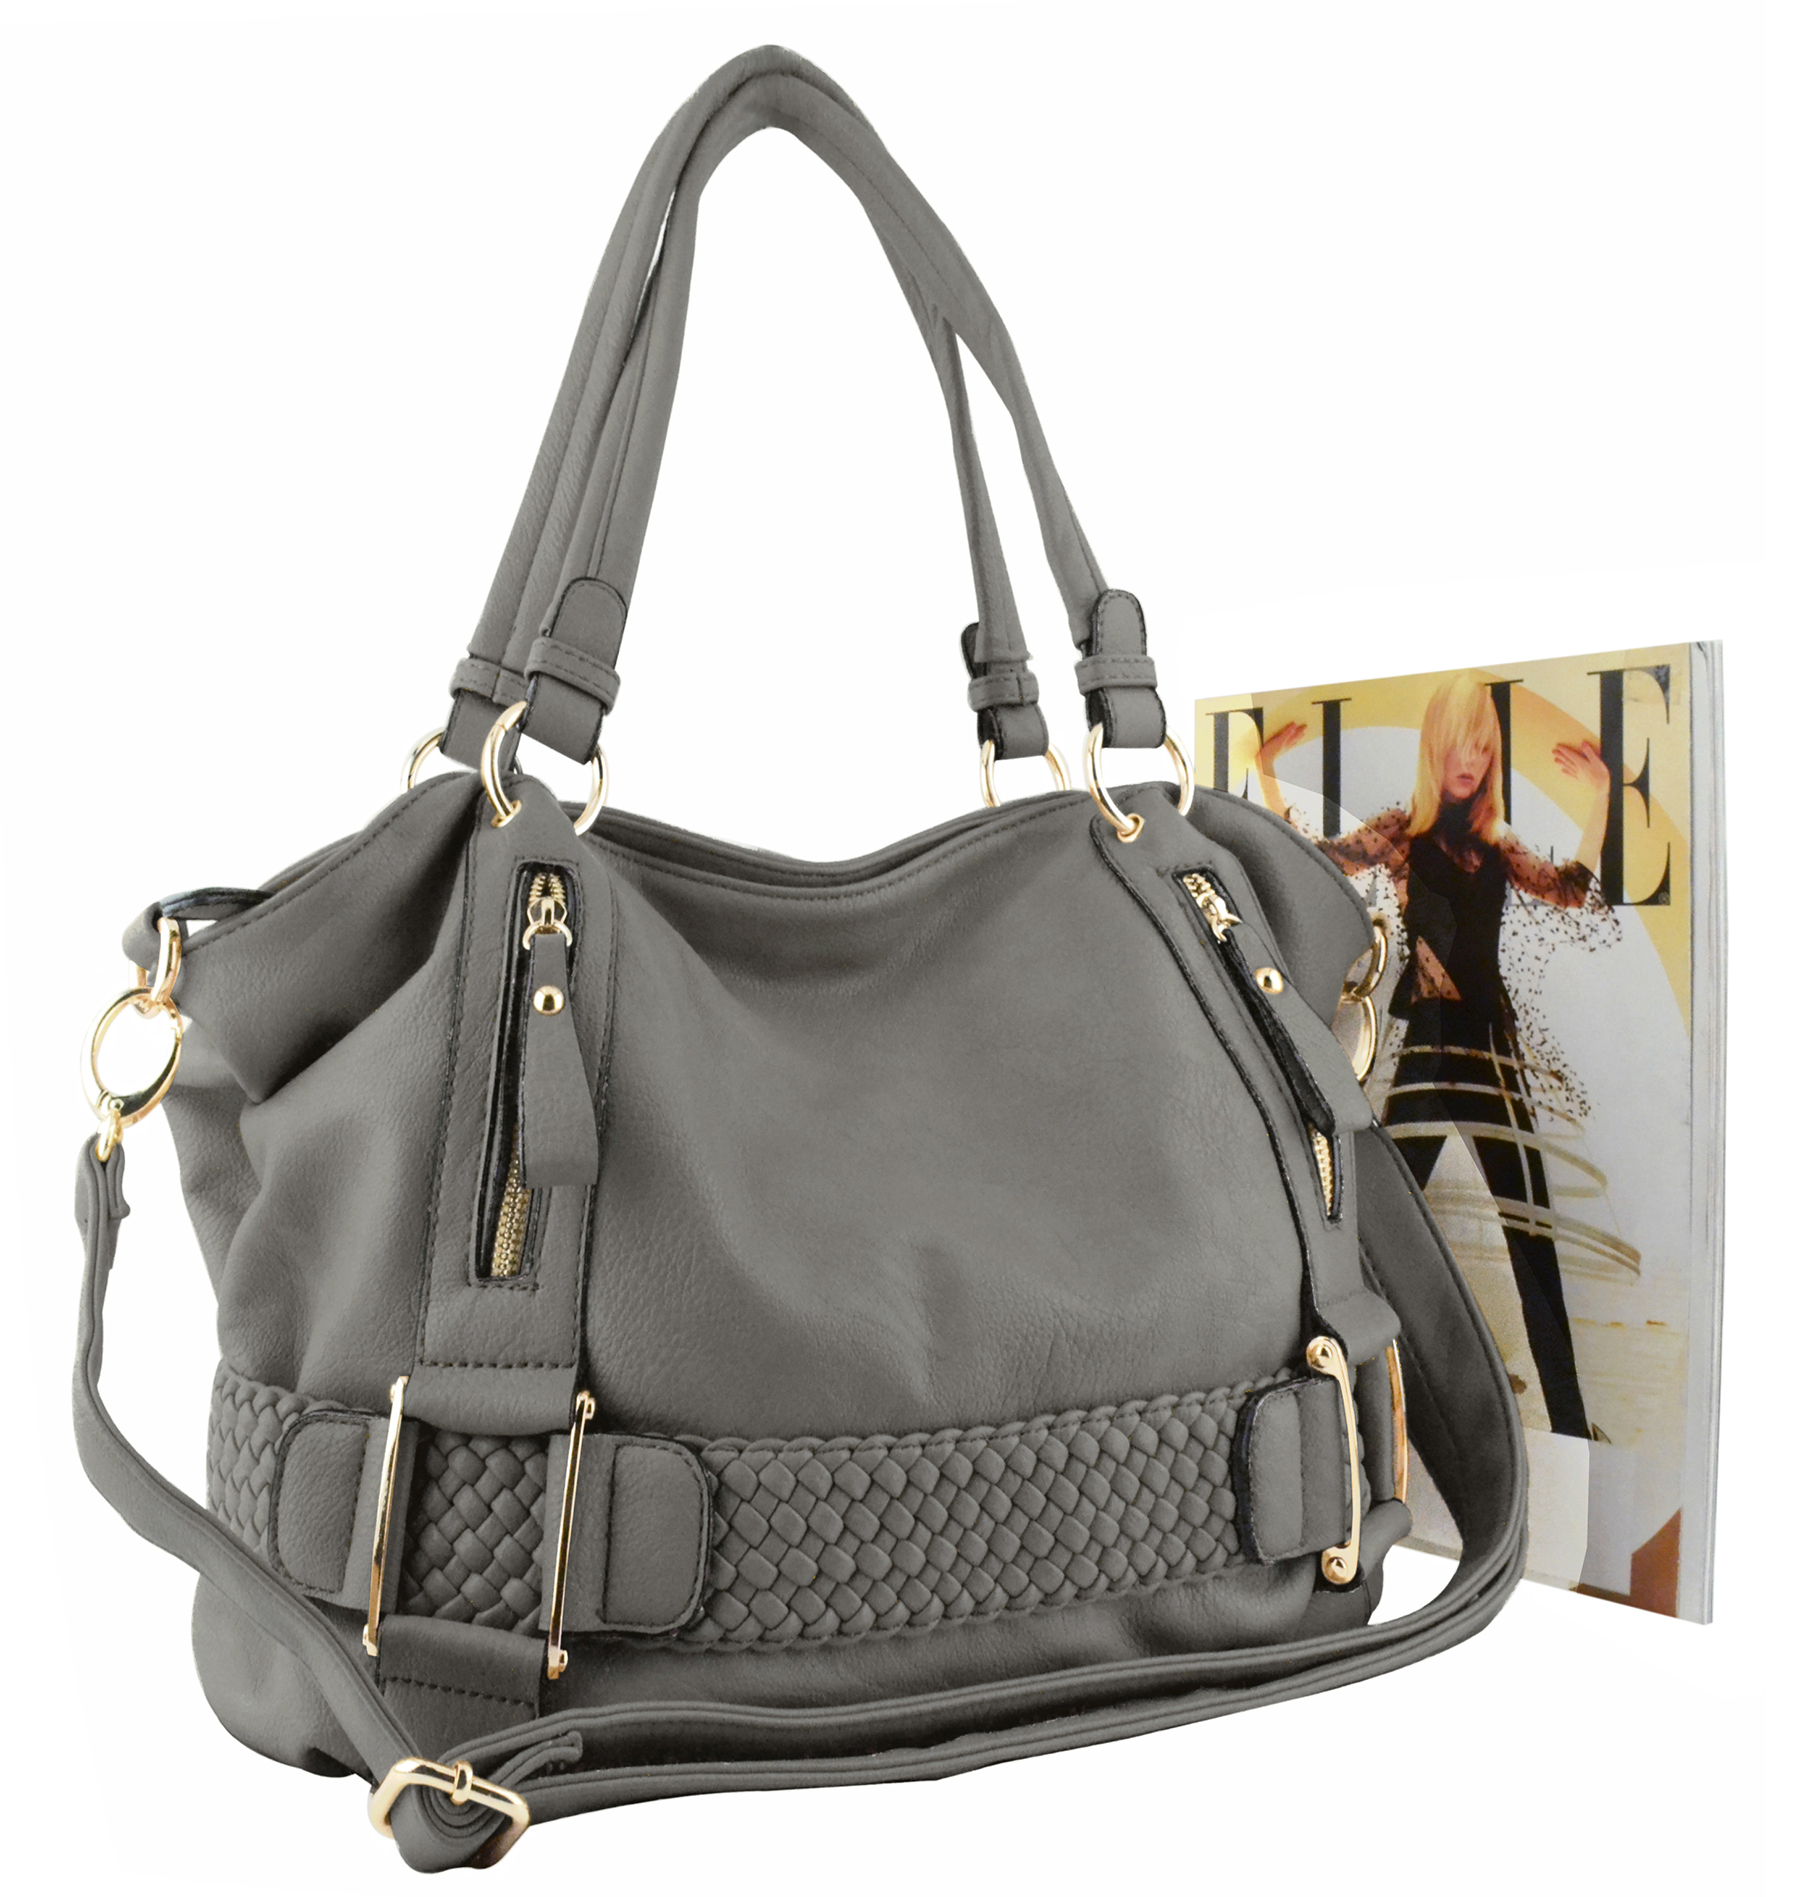 SAMANTHA Dark Grey Weave Pattern Soft Hobo Handbag Size